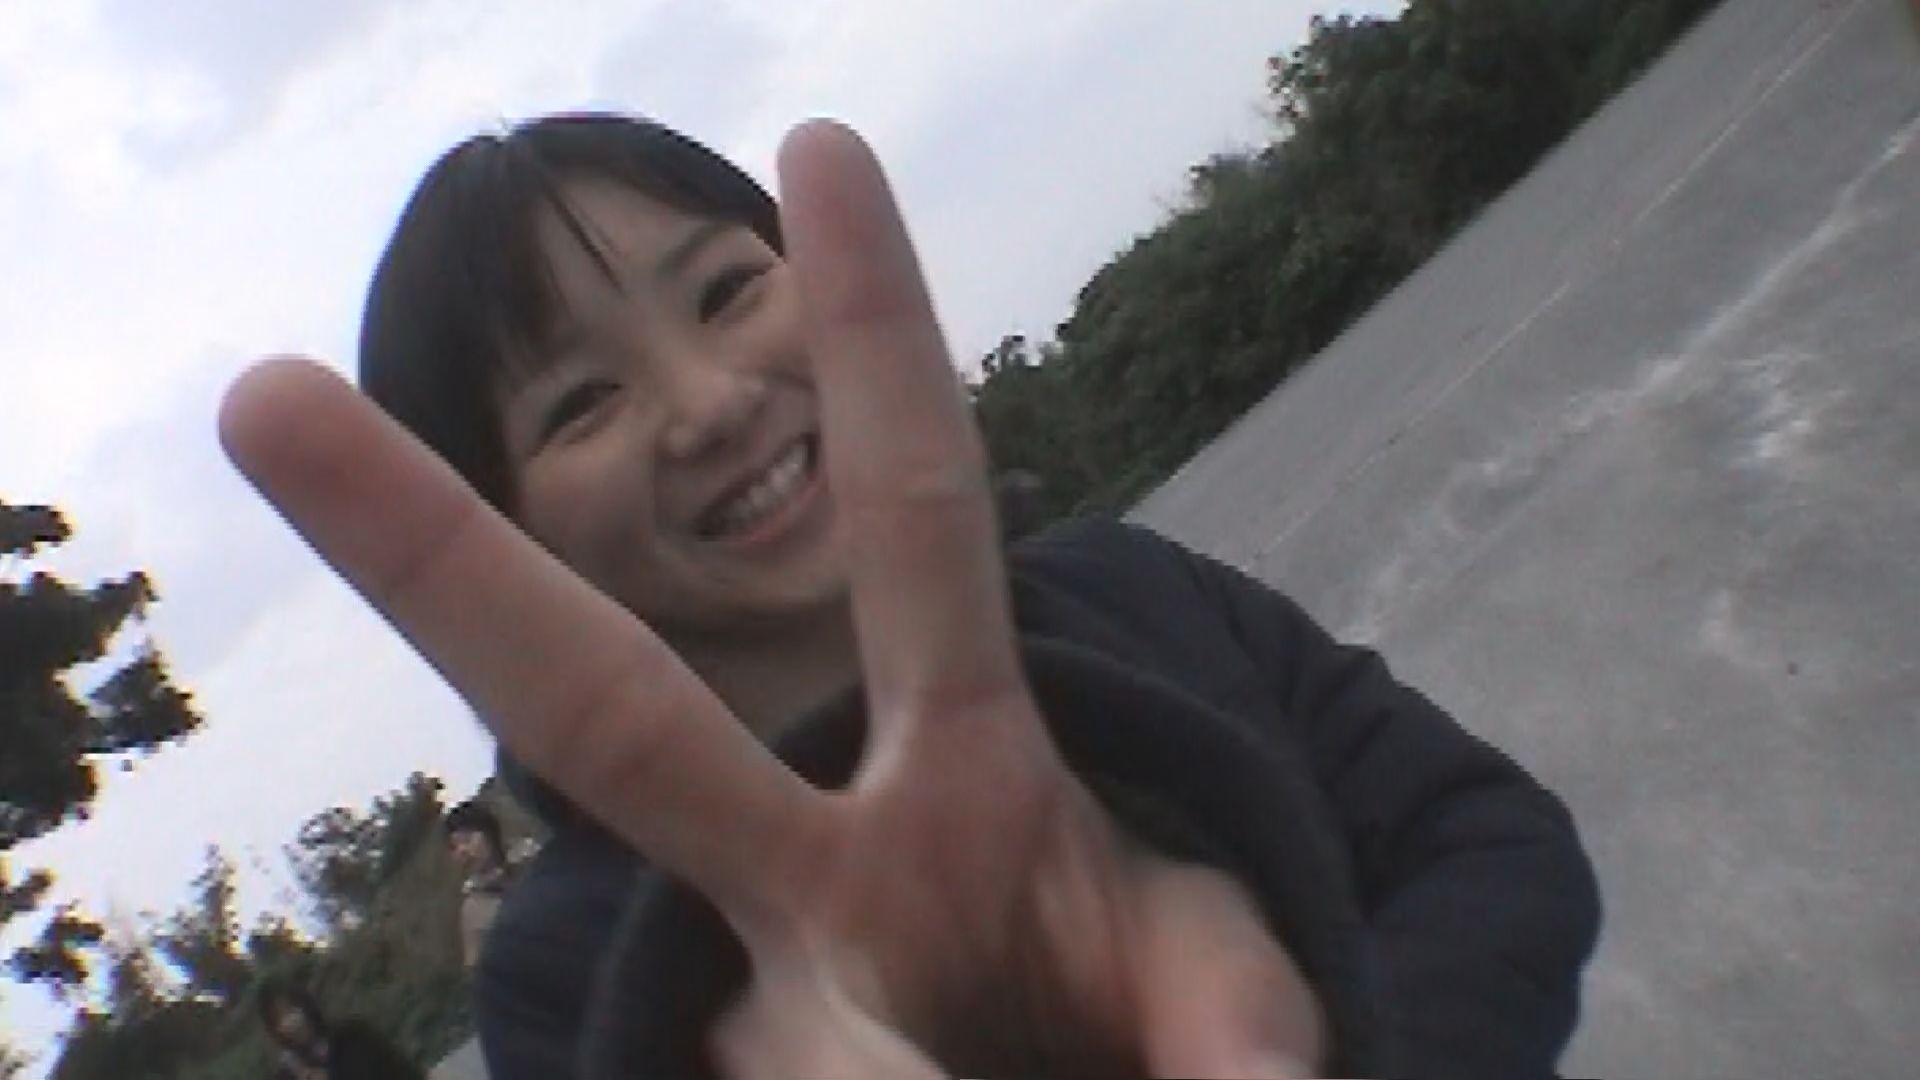 kei vol.1 / けい 10